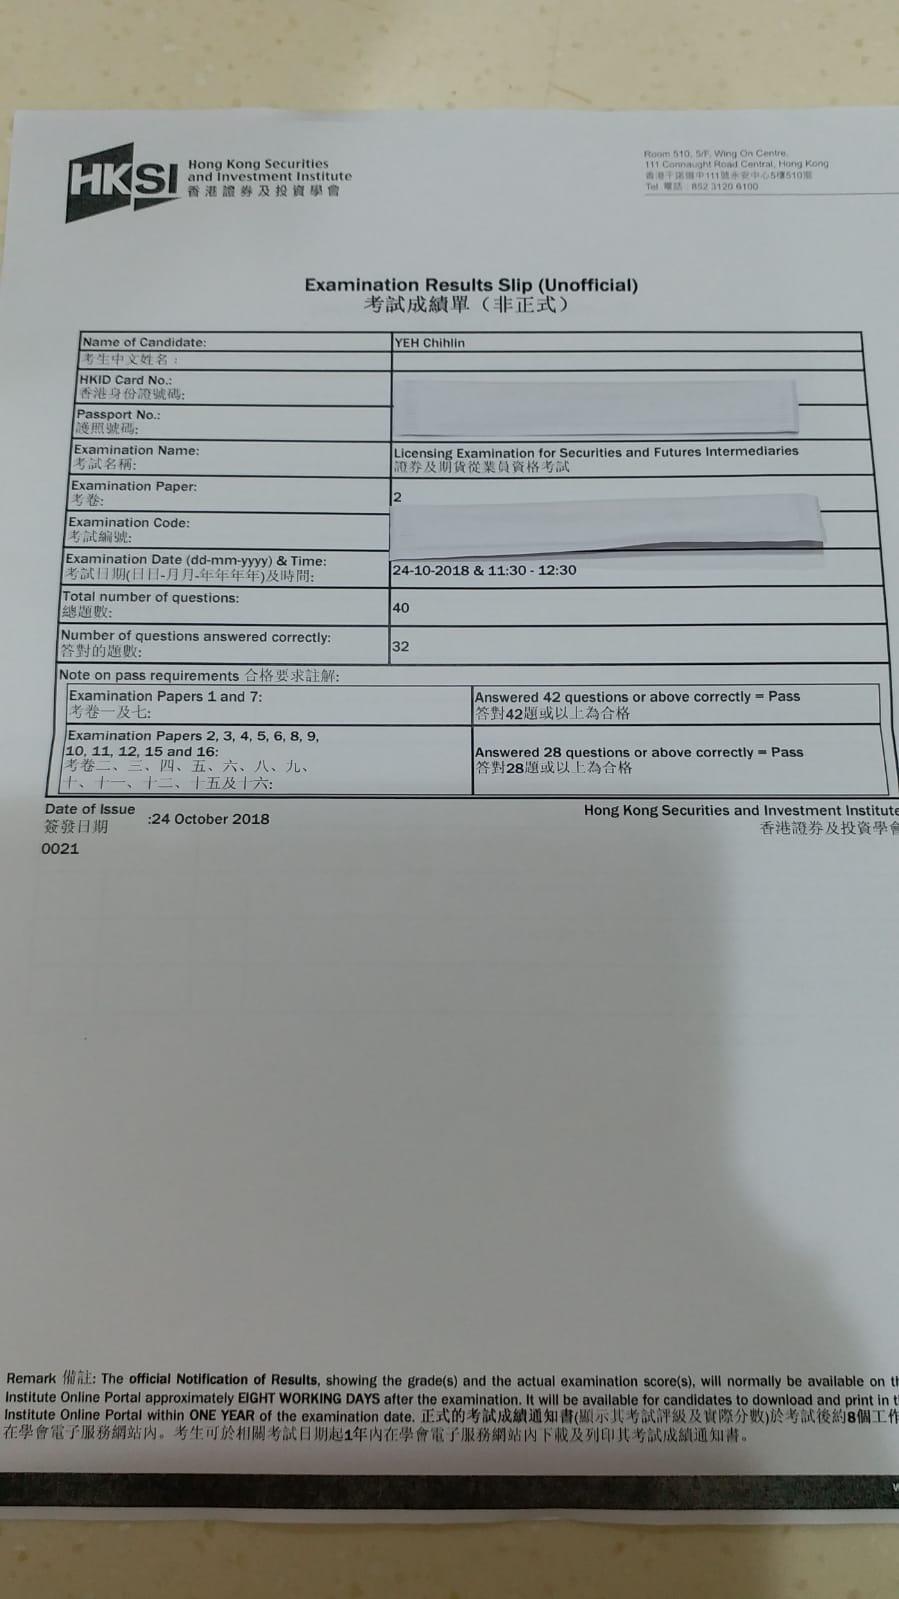 CLY 24/10/2018 LE Paper 2 證券期貨從業員資格考試卷二 Pass